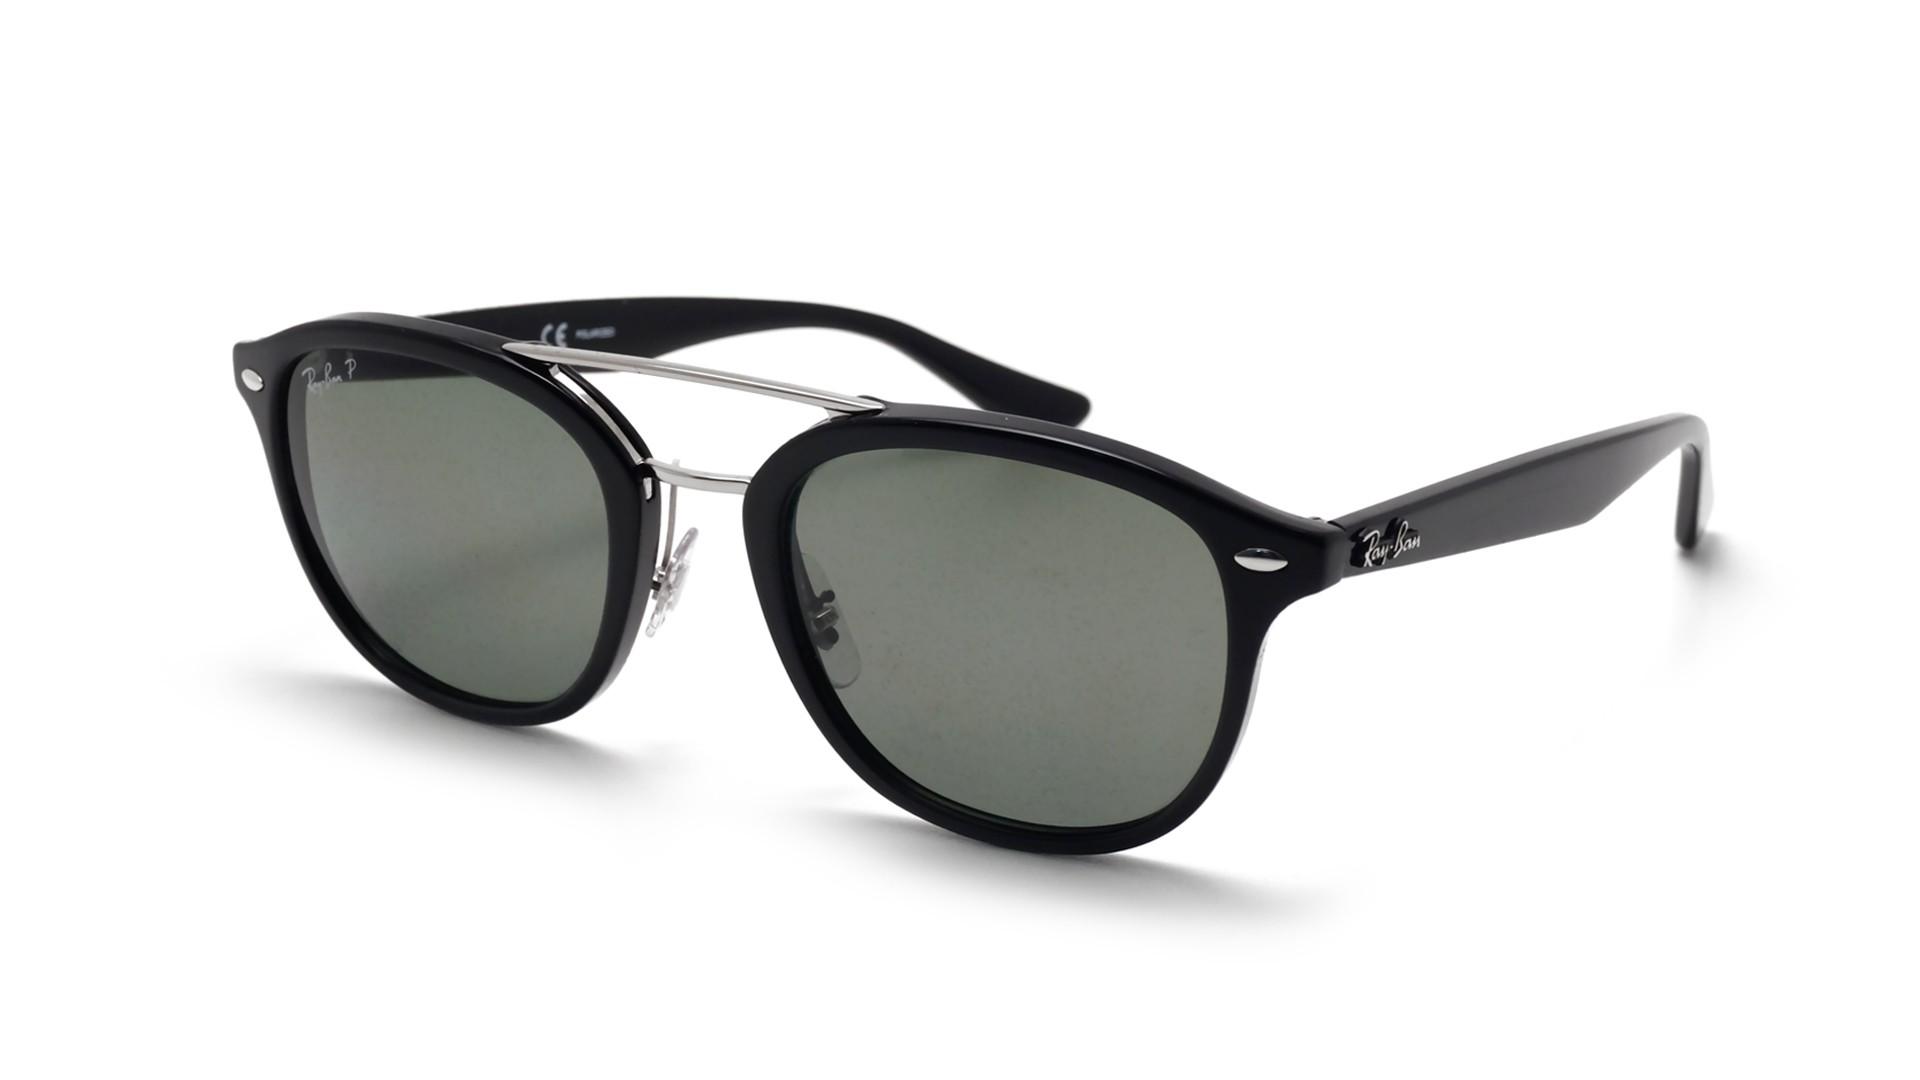 e558d88087f Sunglasses Ray-Ban Highstreet Black RB2183 901 9A 53-21 Medium Polarized